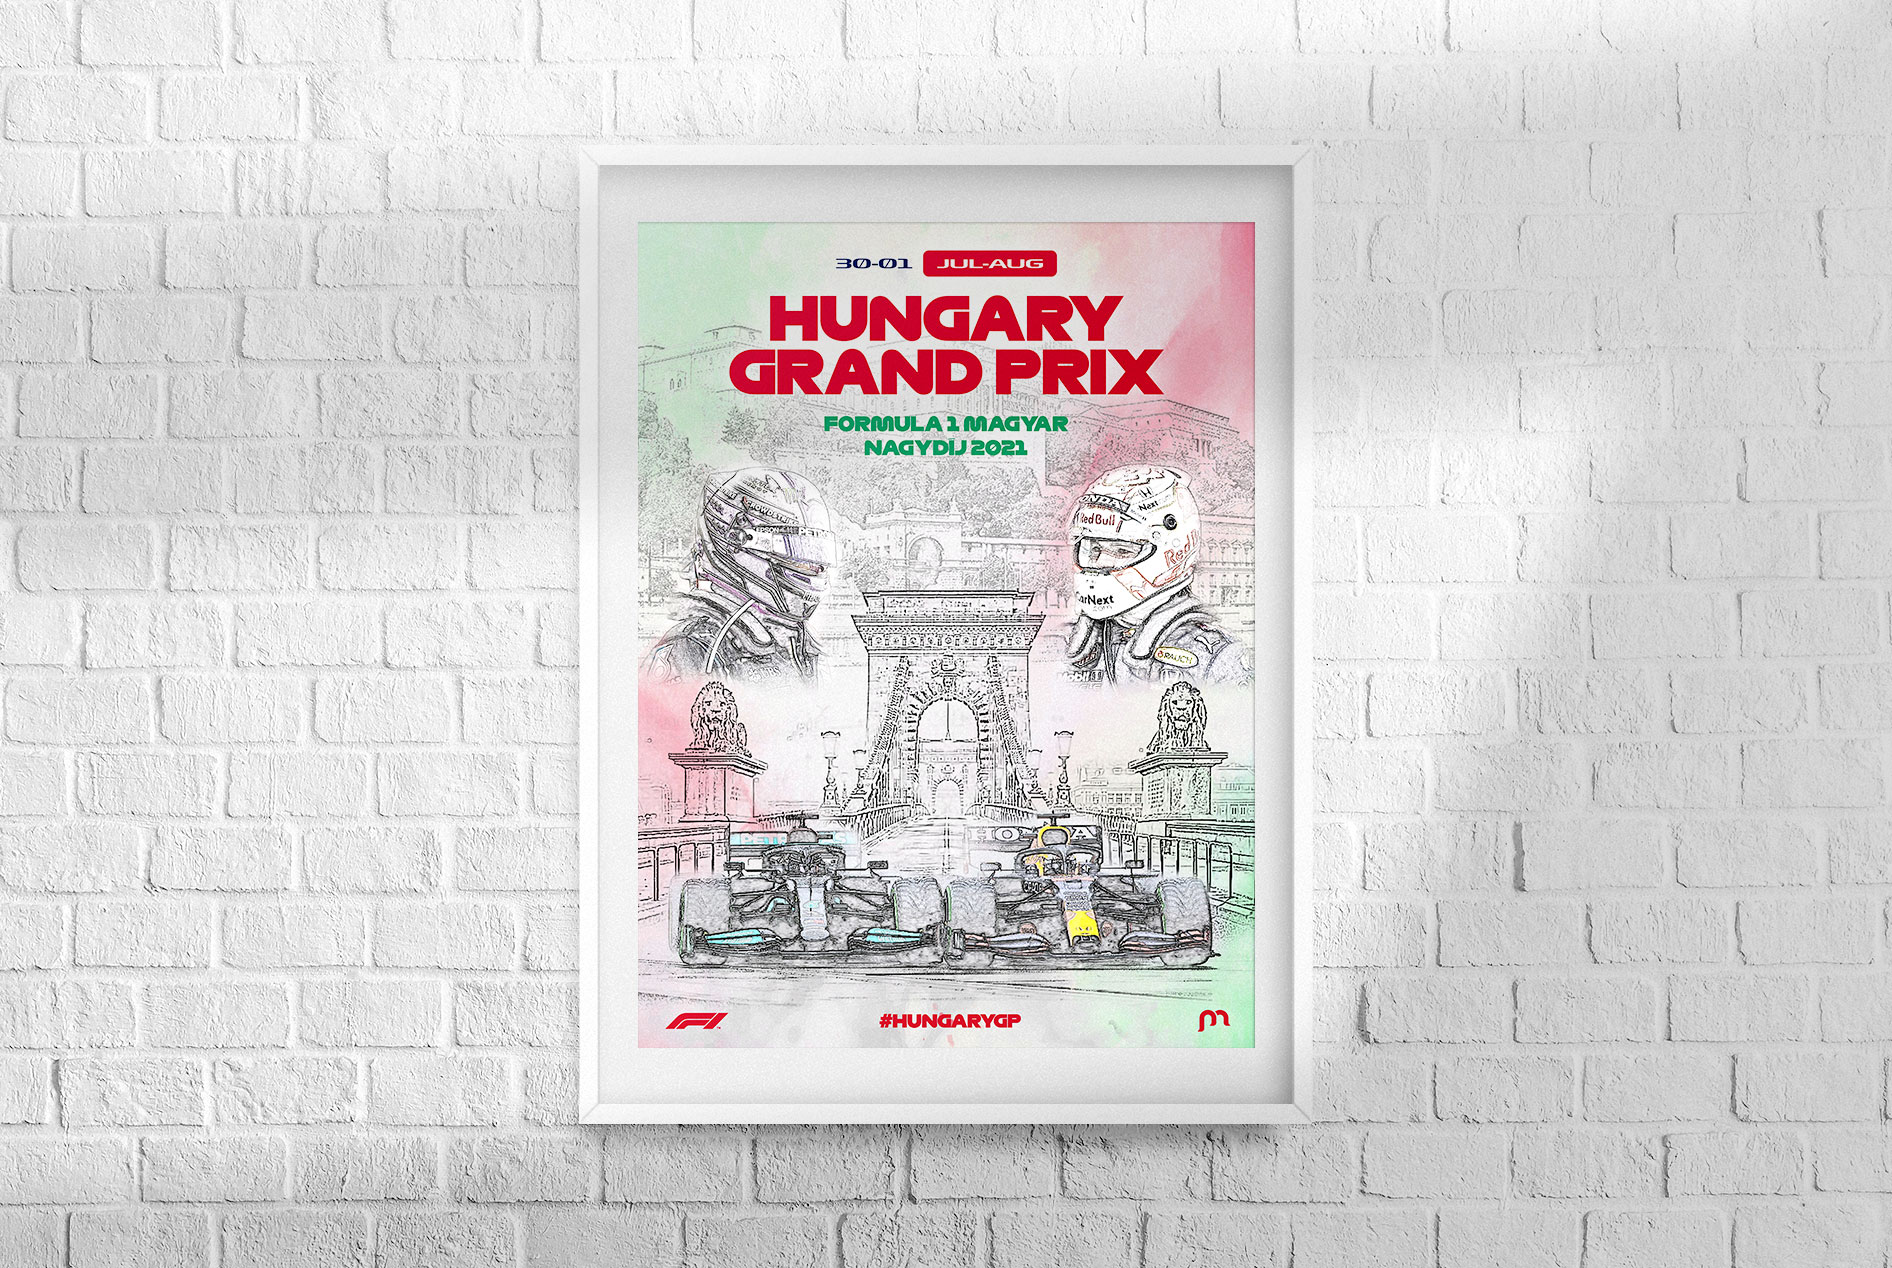 Hungary F1 Grand Prix 2021 Poster